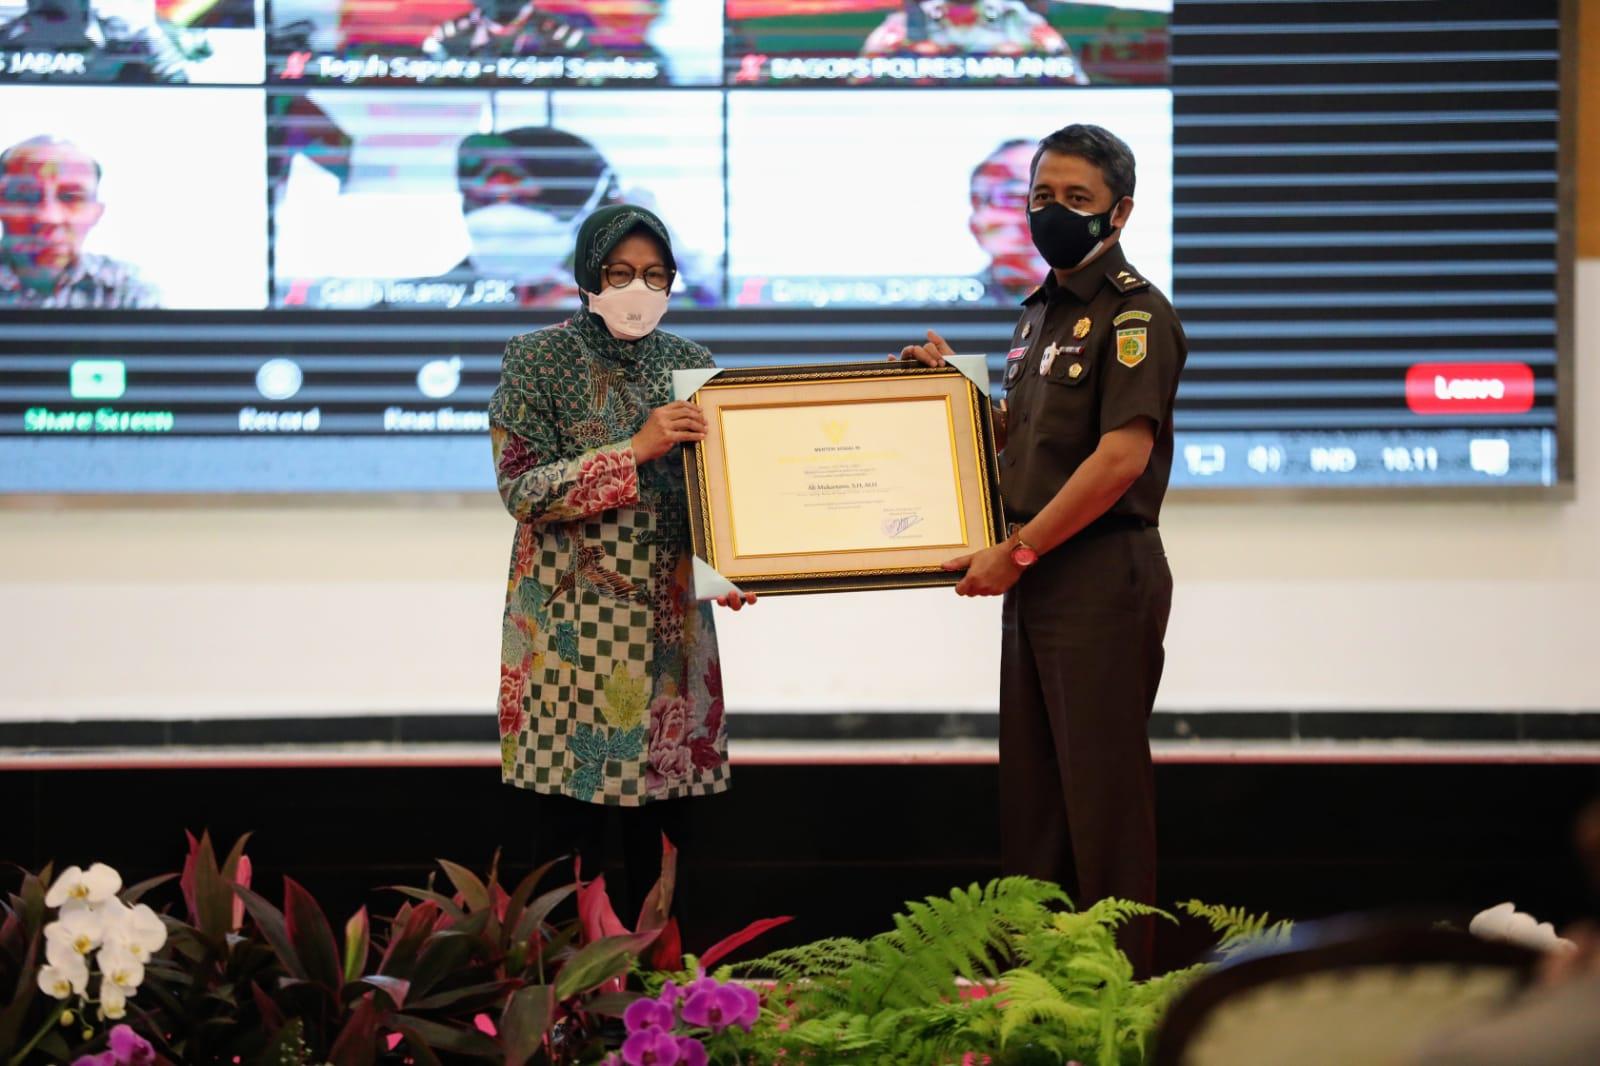 Mensos Risma Berikan Penghargaan Bagi 143 Aparat Penegak Hukum